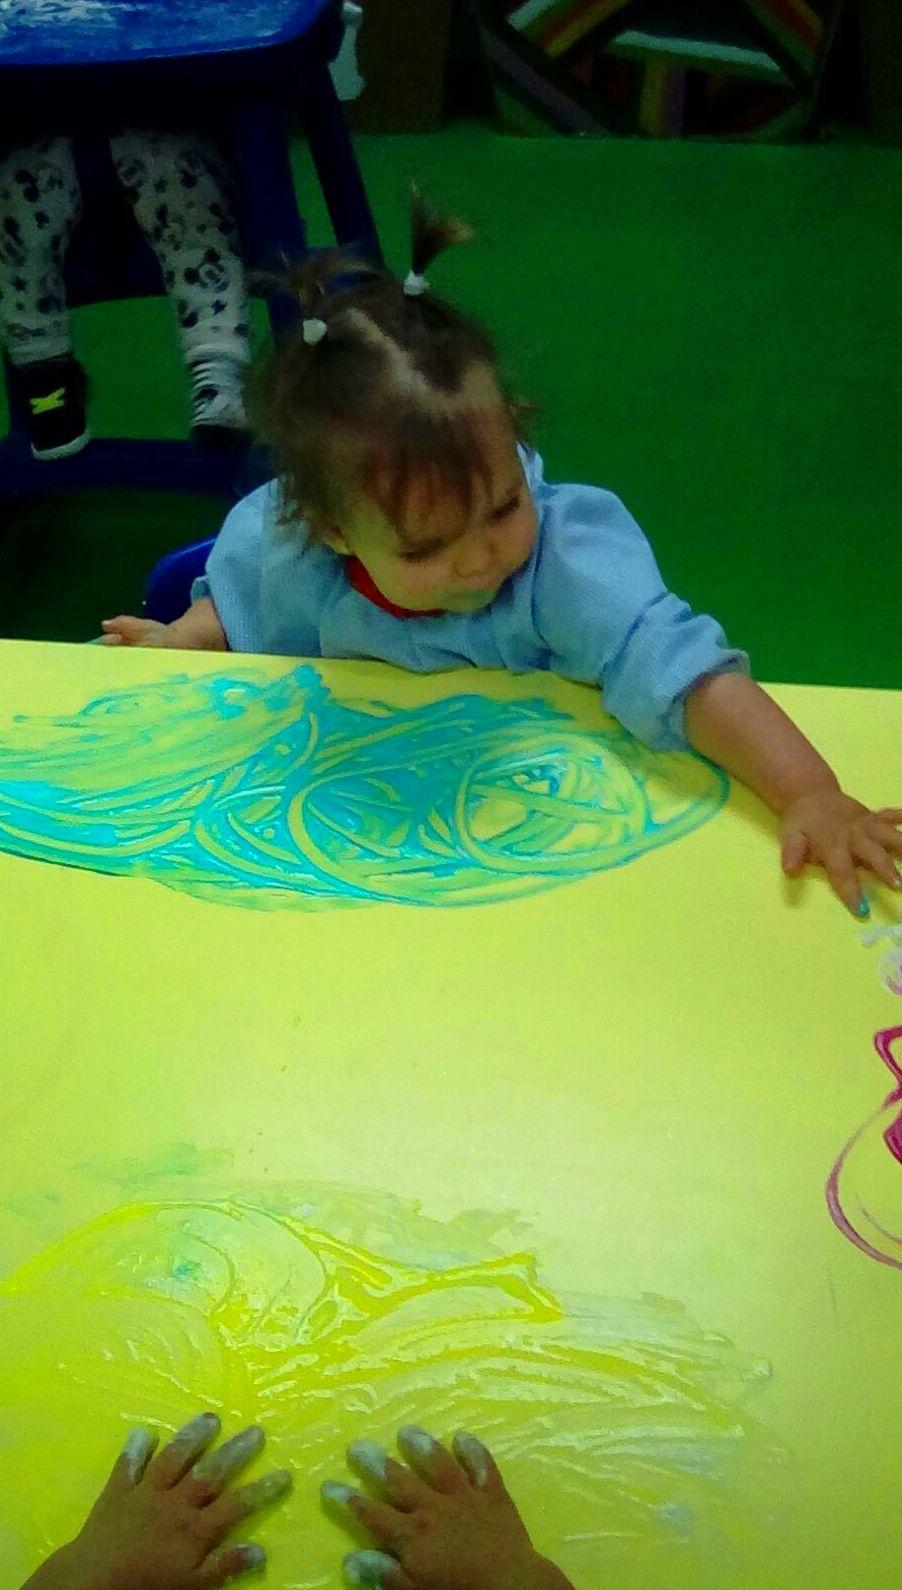 Foto 3 de Escuela infantil en Algete | E.I. Cuatro Pecas de Colores